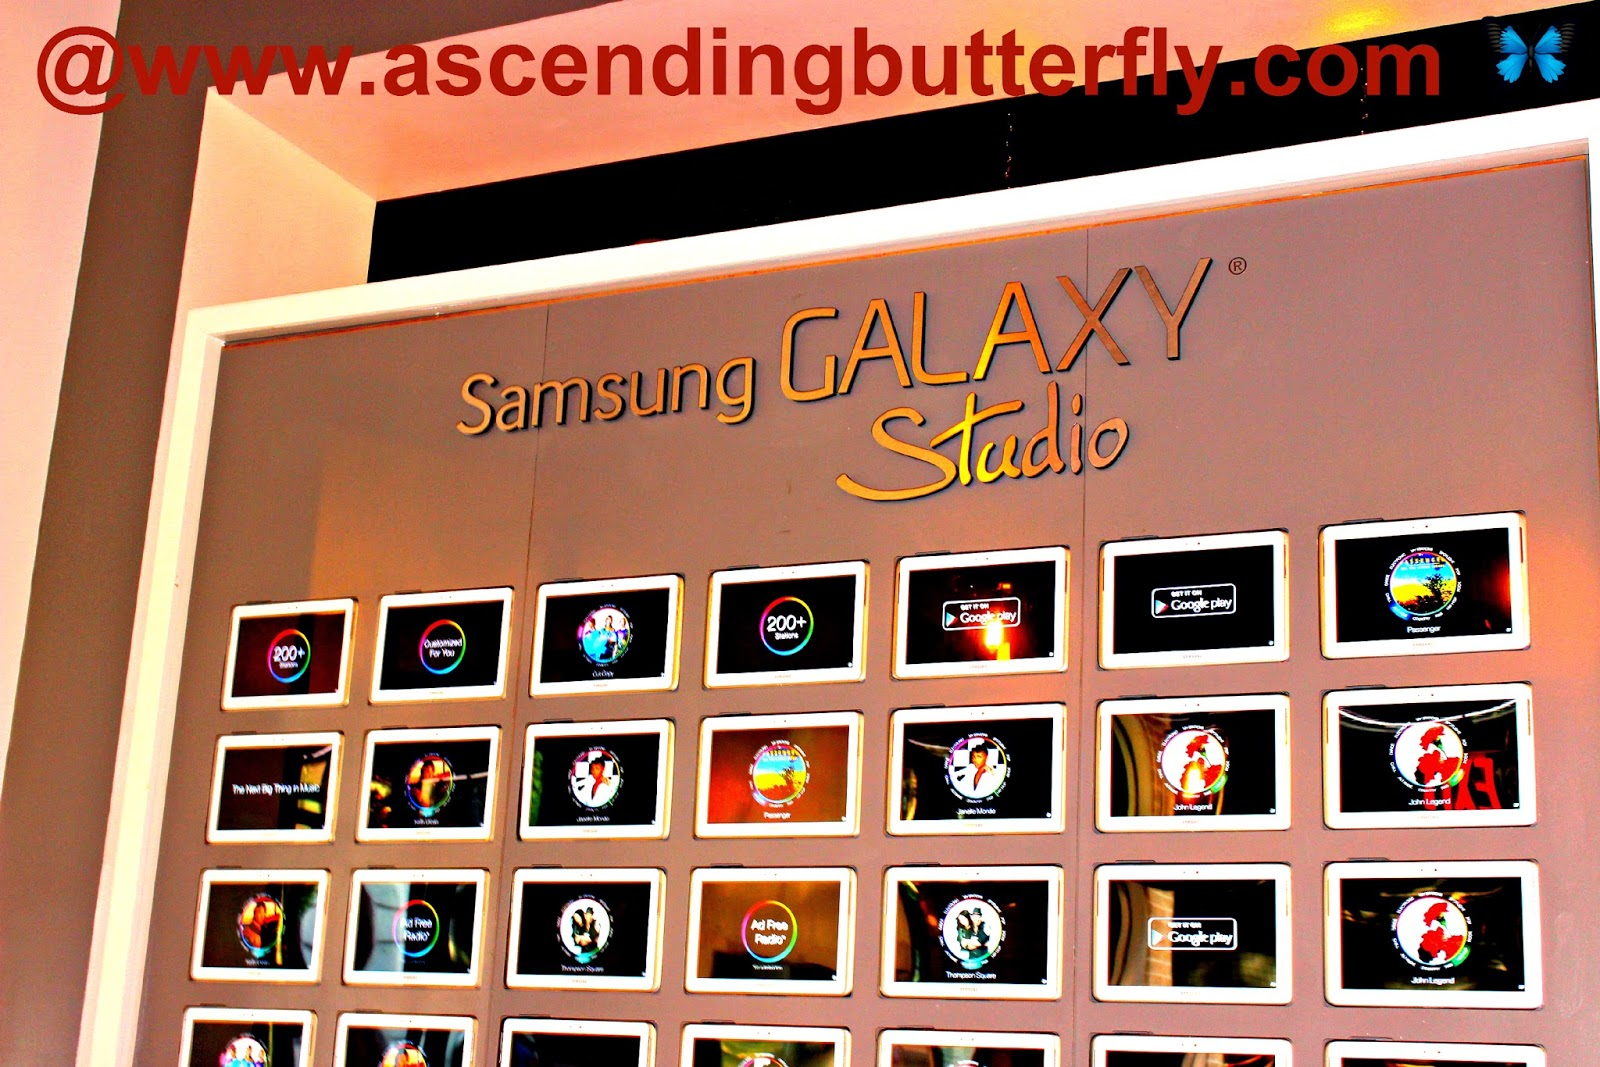 Samsung Galaxy Studio SoHo New York City